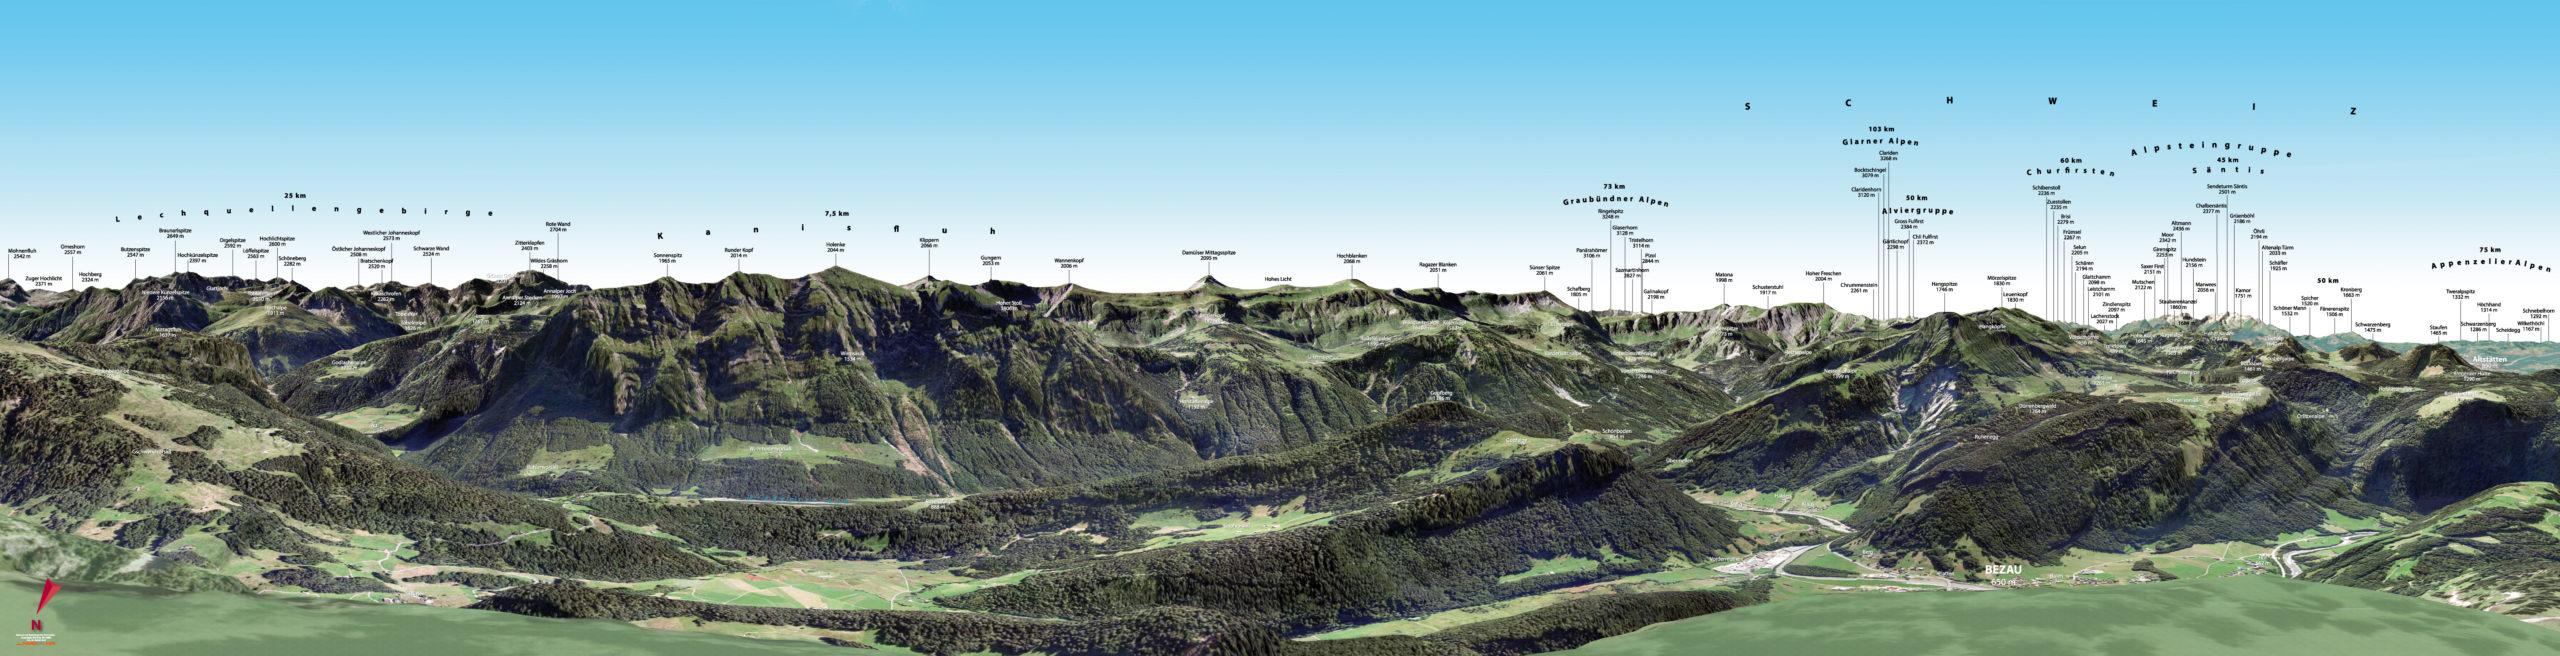 3D Gipfelpanorama Bergstation Gaumgarten Sued